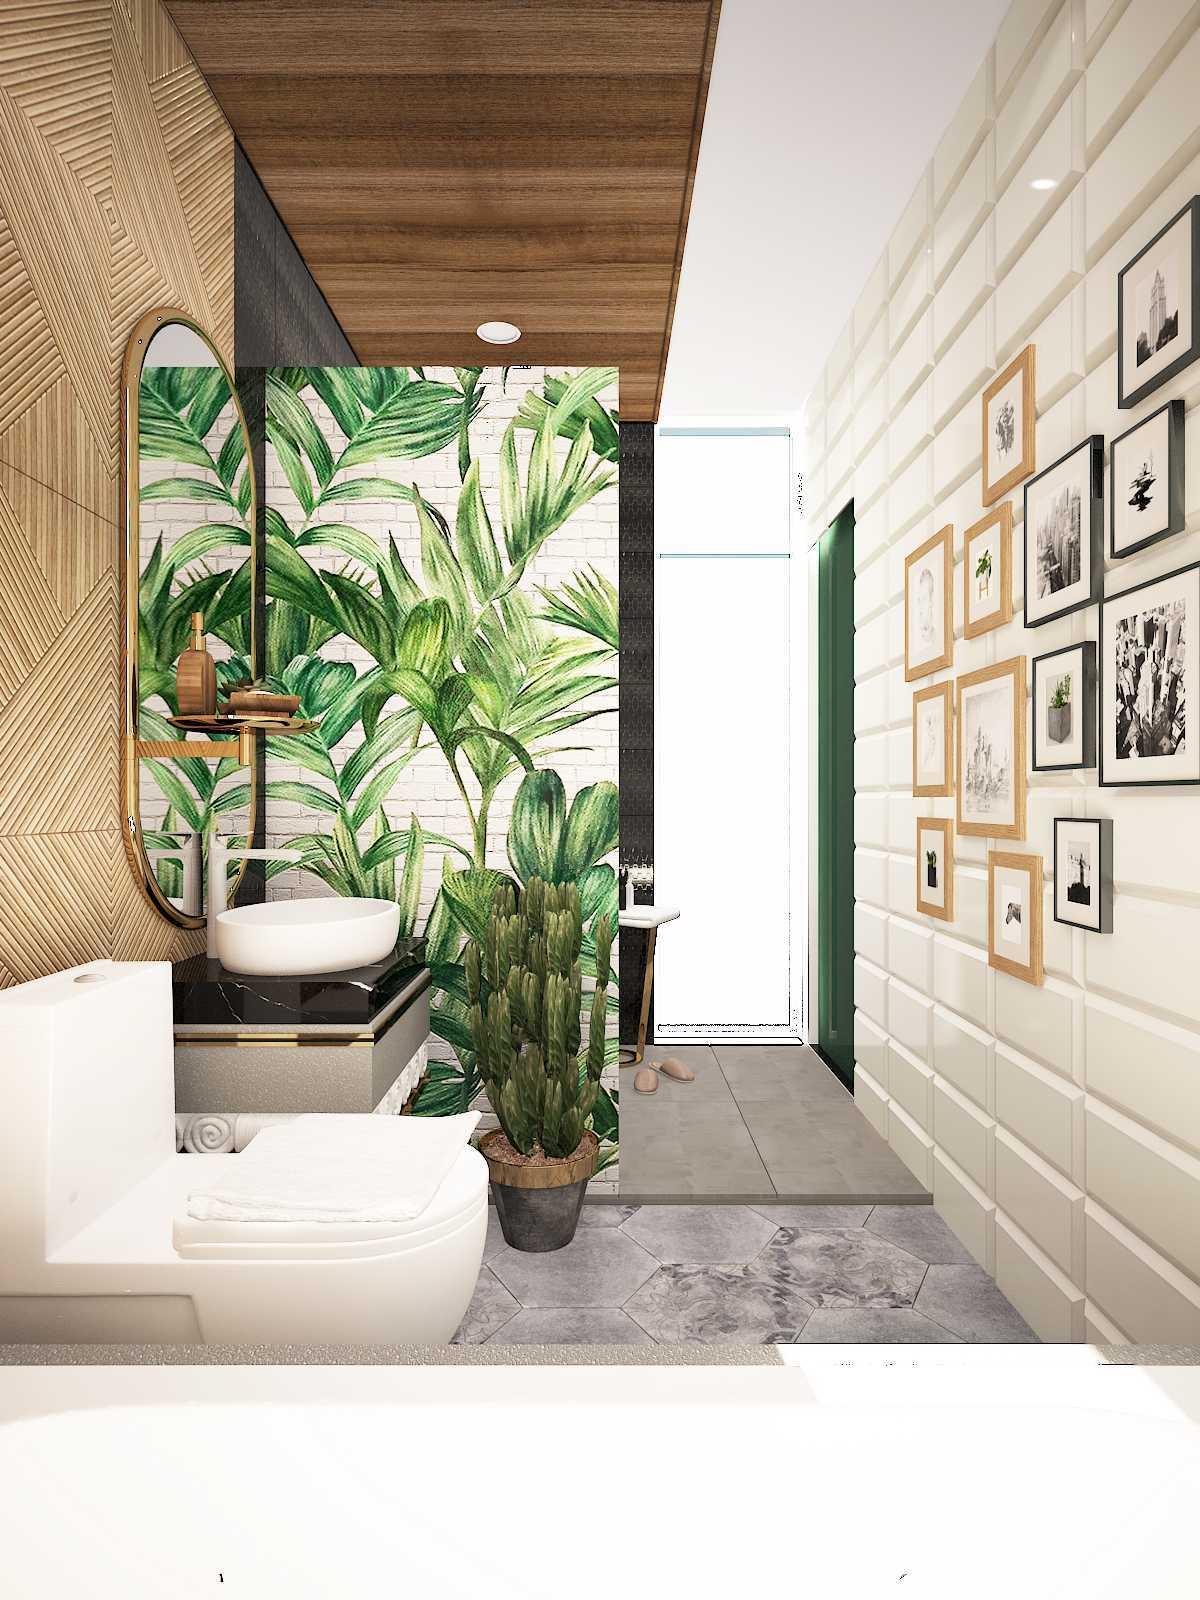 "Arianiz Studio Mr. Royan Bathroom Bukit Sari Jl. Ki Mangunsarkoro No.16, Karangkidul, Kec. Semarang Tengah, Kota Semarang, Jawa Tengah 50241, Indonesia Jl. Ki Mangunsarkoro No.16, Karangkidul, Kec. Semarang Tengah, Kota Semarang, Jawa Tengah 50241, Indonesia Arianiz-Studio-Man-Bathroom Modern <P>R - ""man"" Bathroom</p> <P>Luas Area : 10 M2</p> 119942"